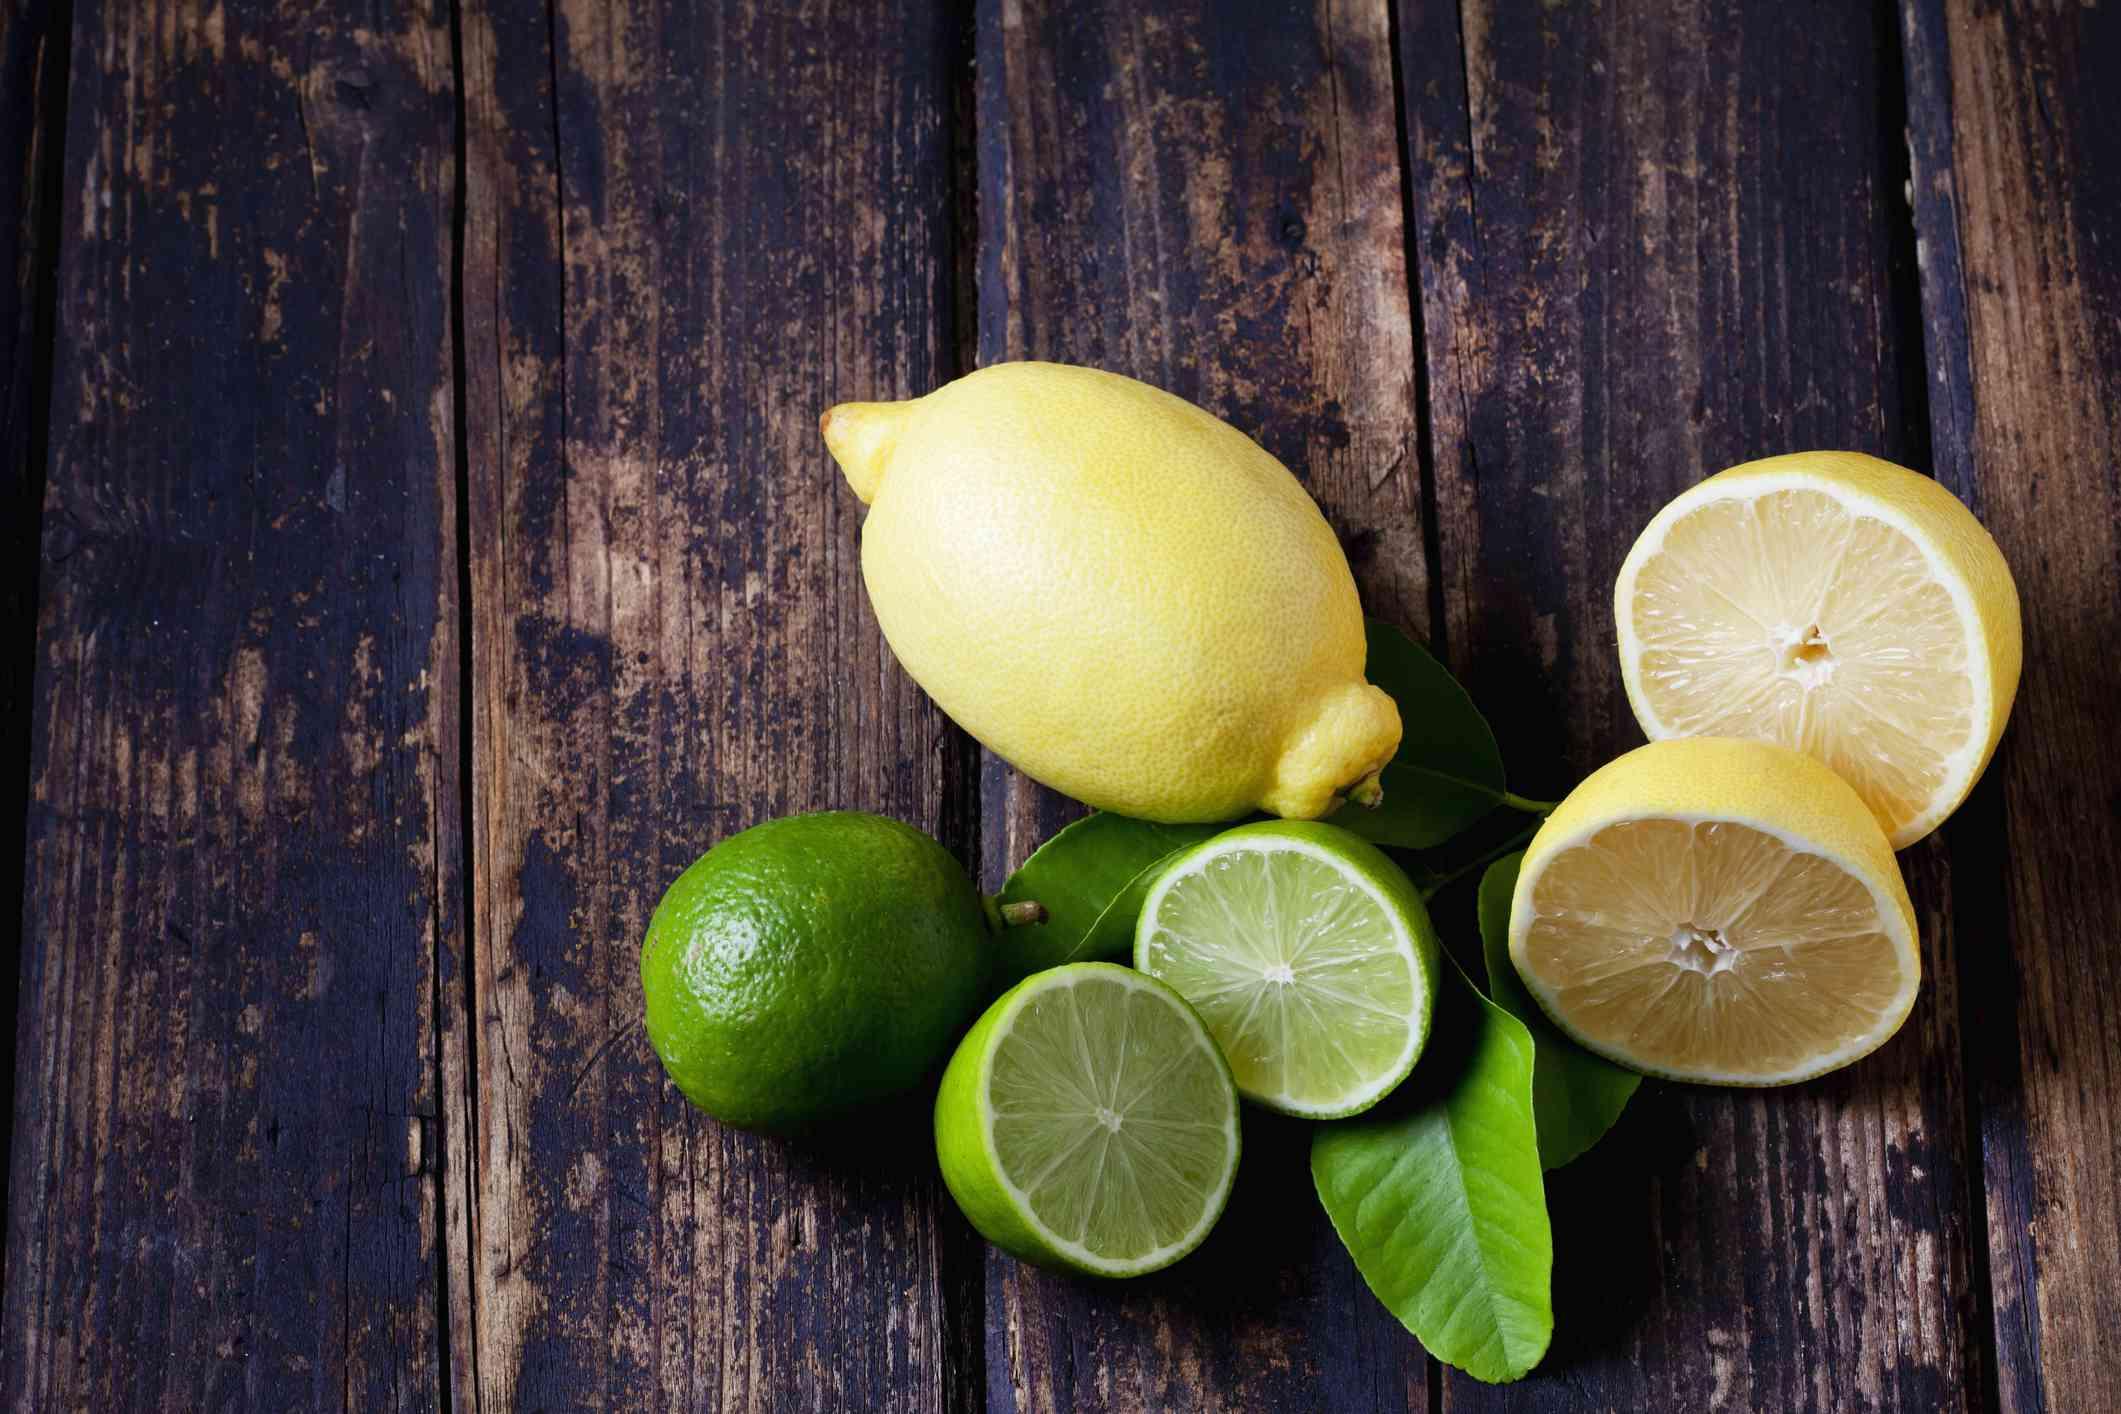 Sliced lemons and limes on a table for blackhead treatment.